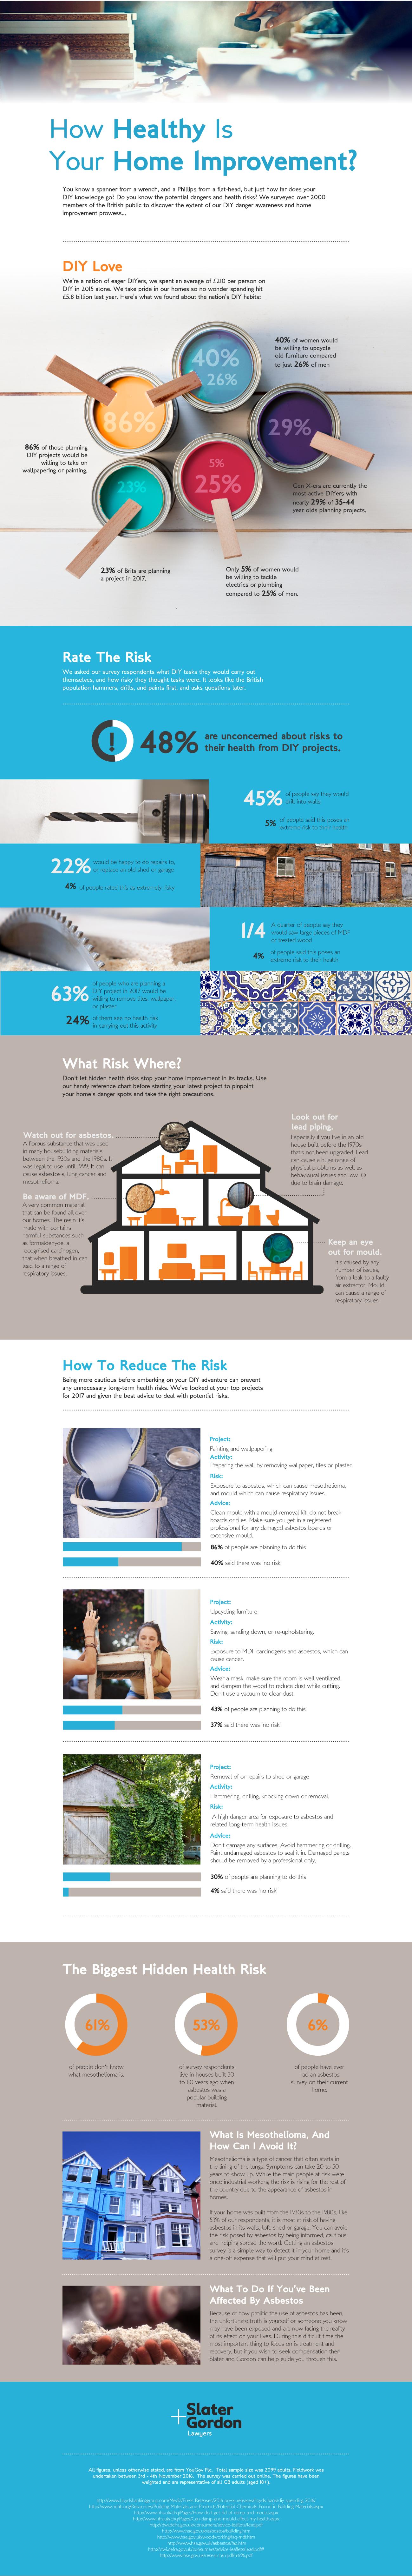 FINALSlaterGordon DIY Infographic v2